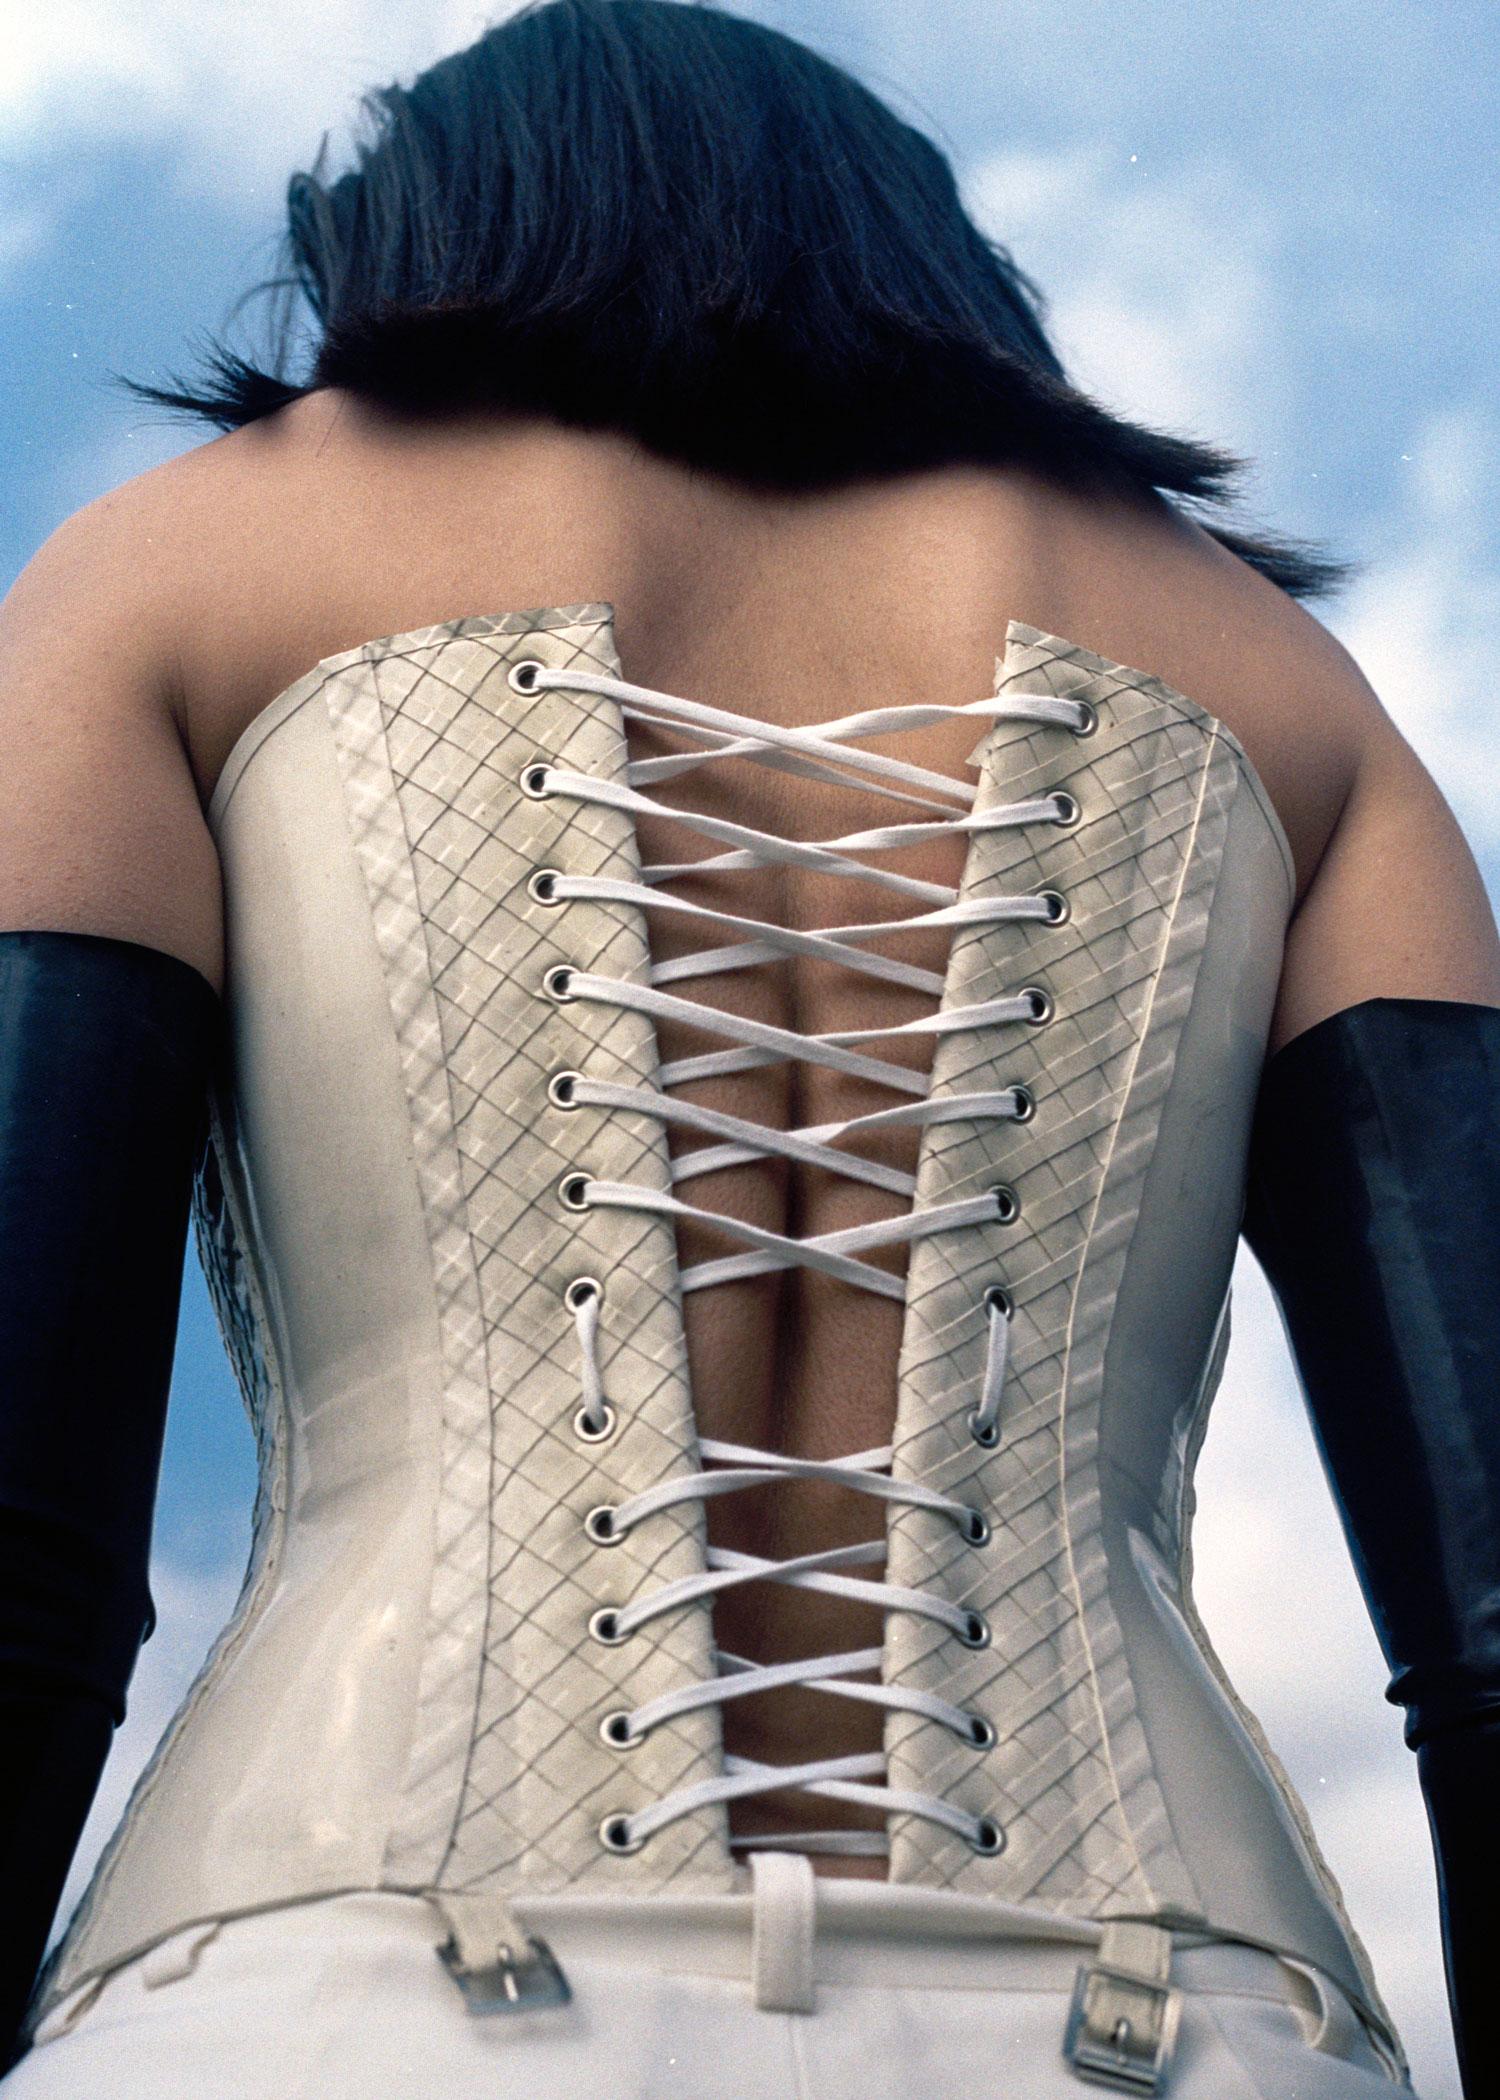 gloves + corset  HOUSE OF HARLOT ,trousers  SJCHO